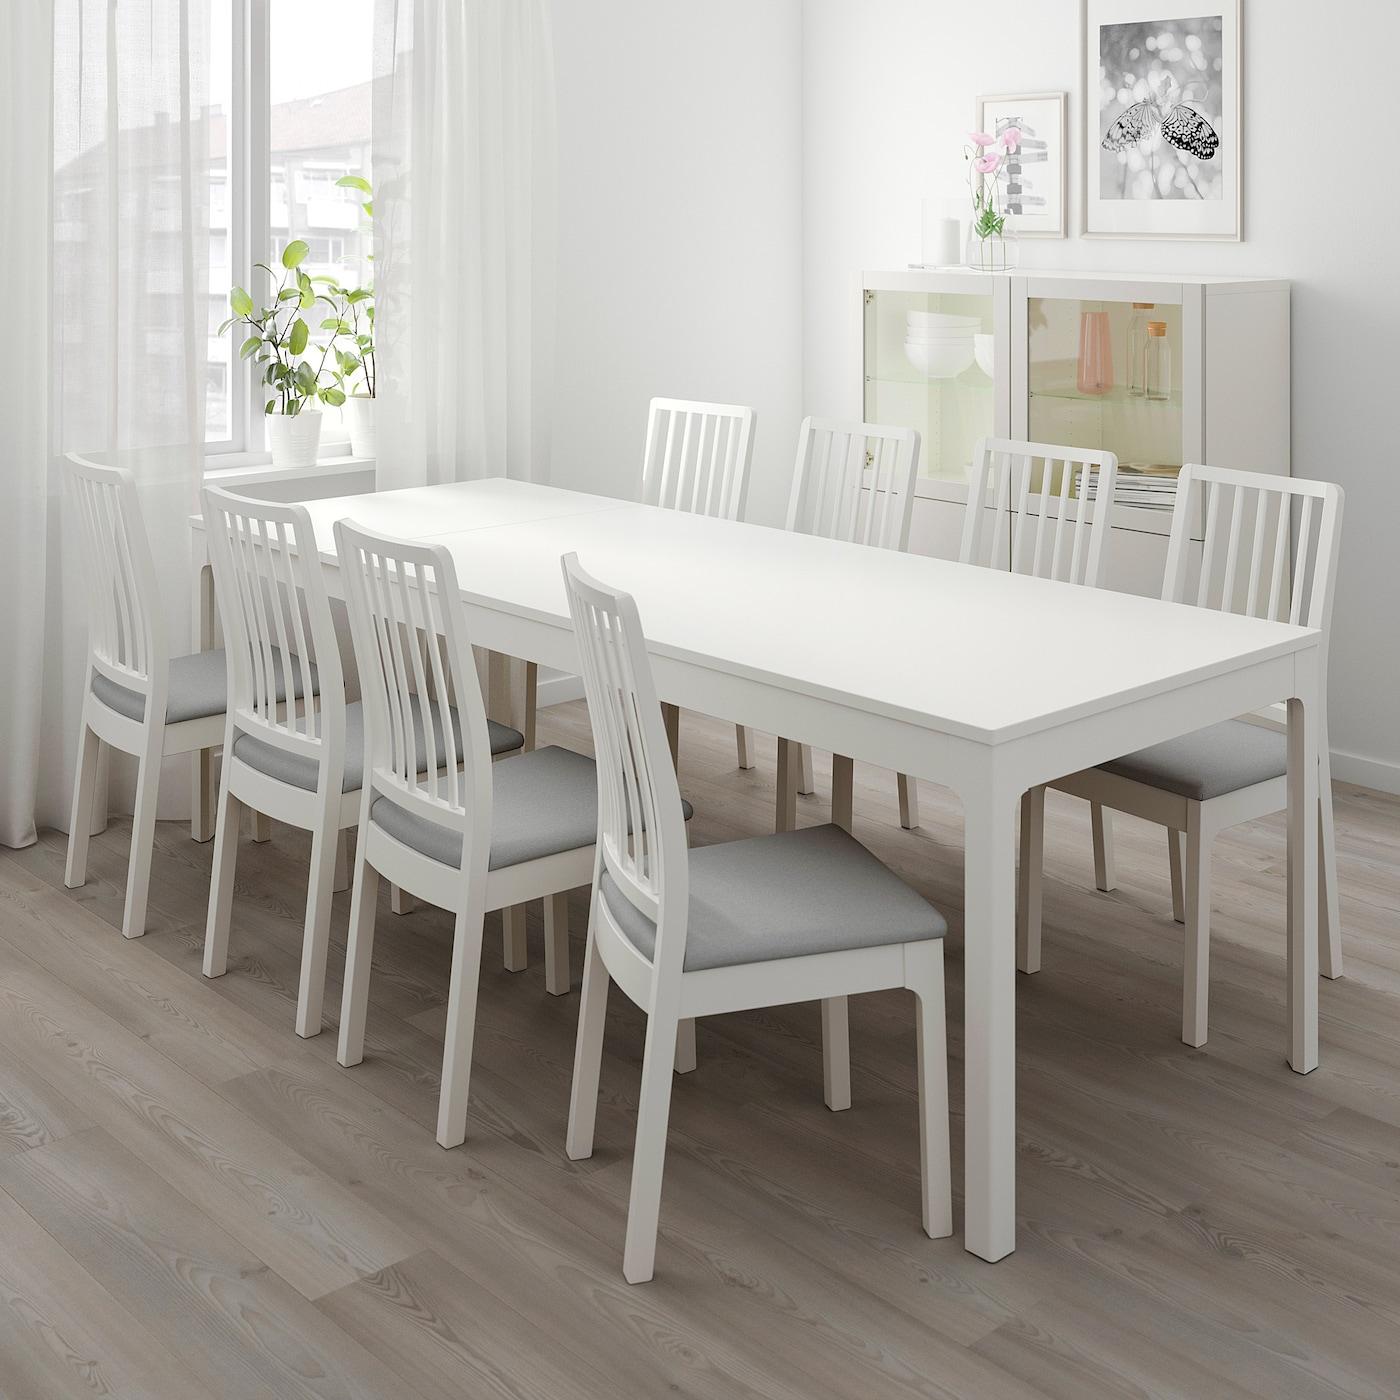 Ekedalen Extendable Table White 180 240x90 Cm Ikea